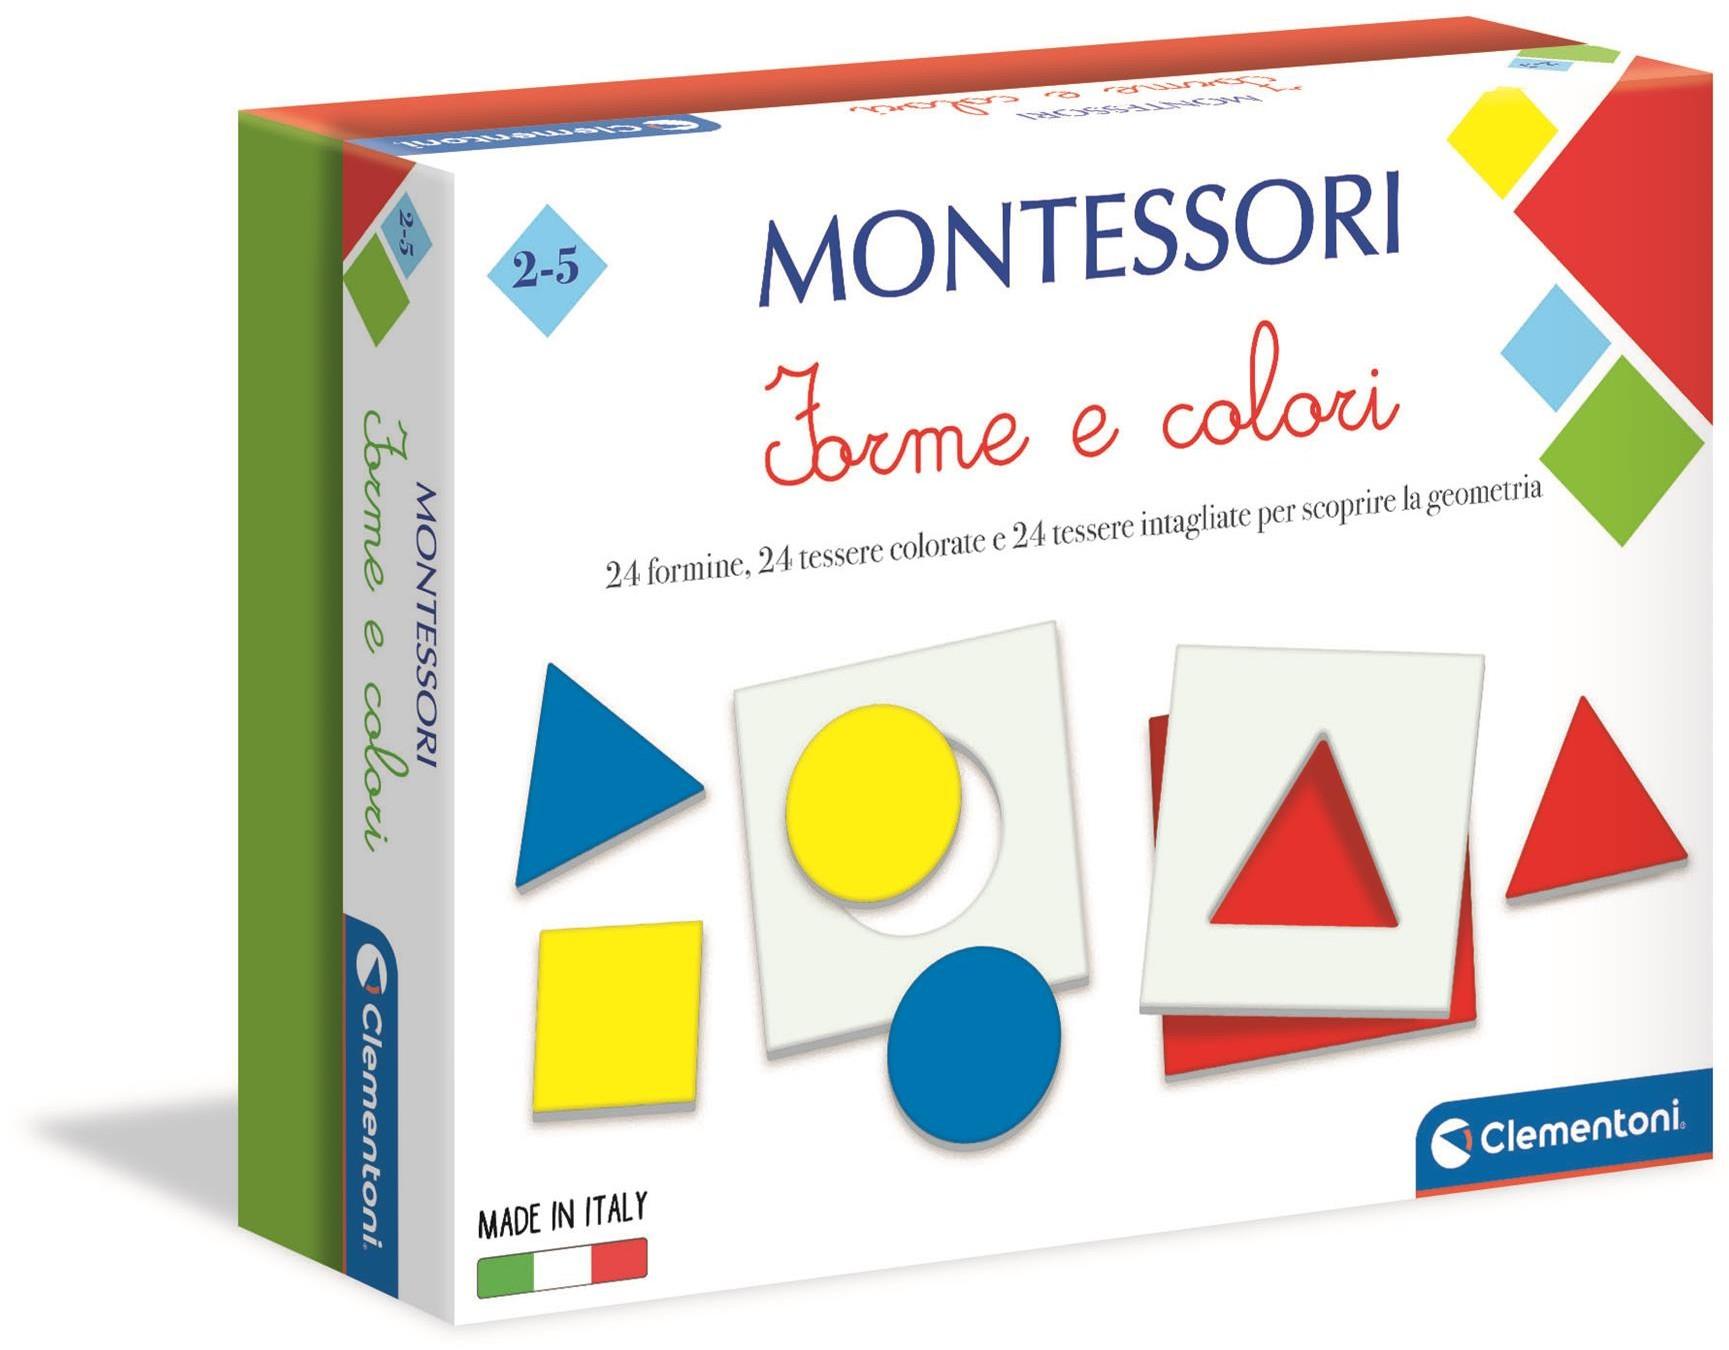 Clementoni Montessori Kształty i kolory 50692